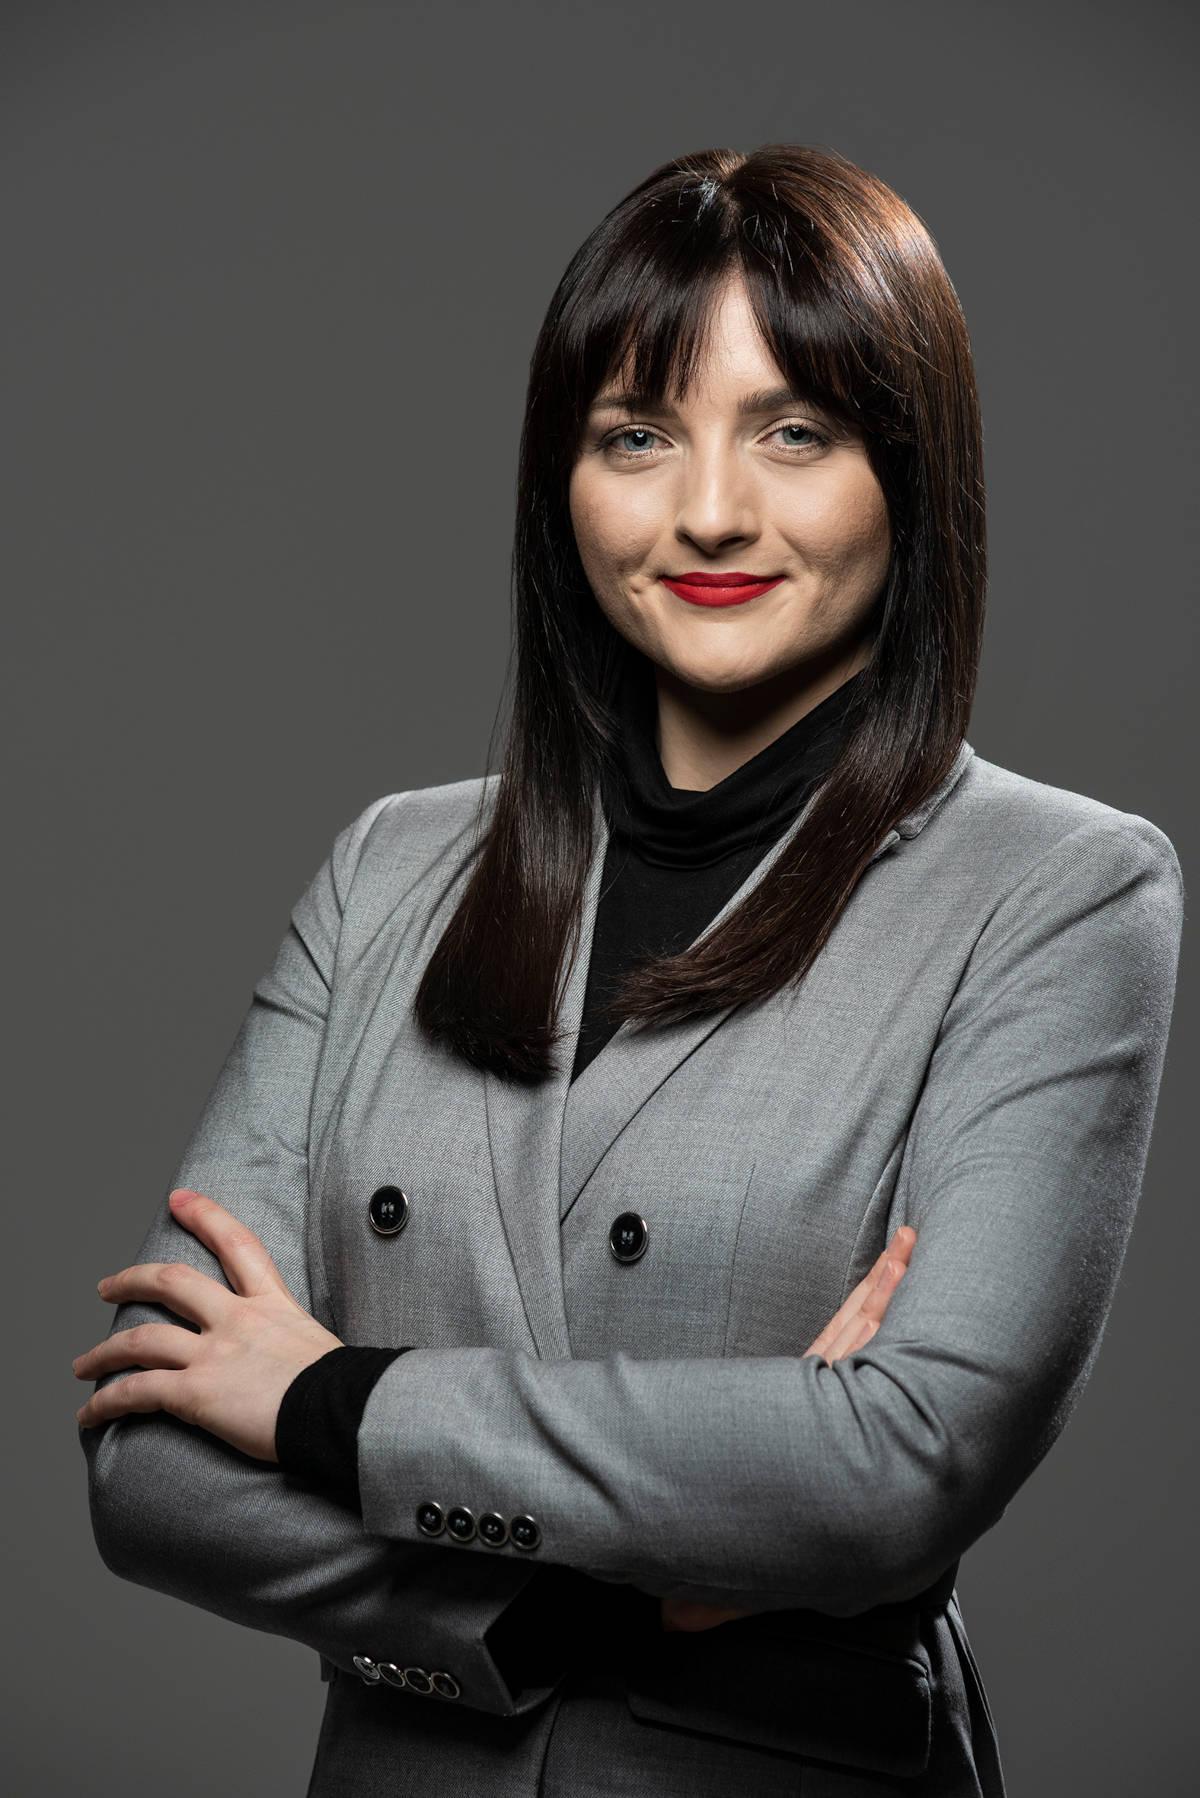 Justyna Gosciewska